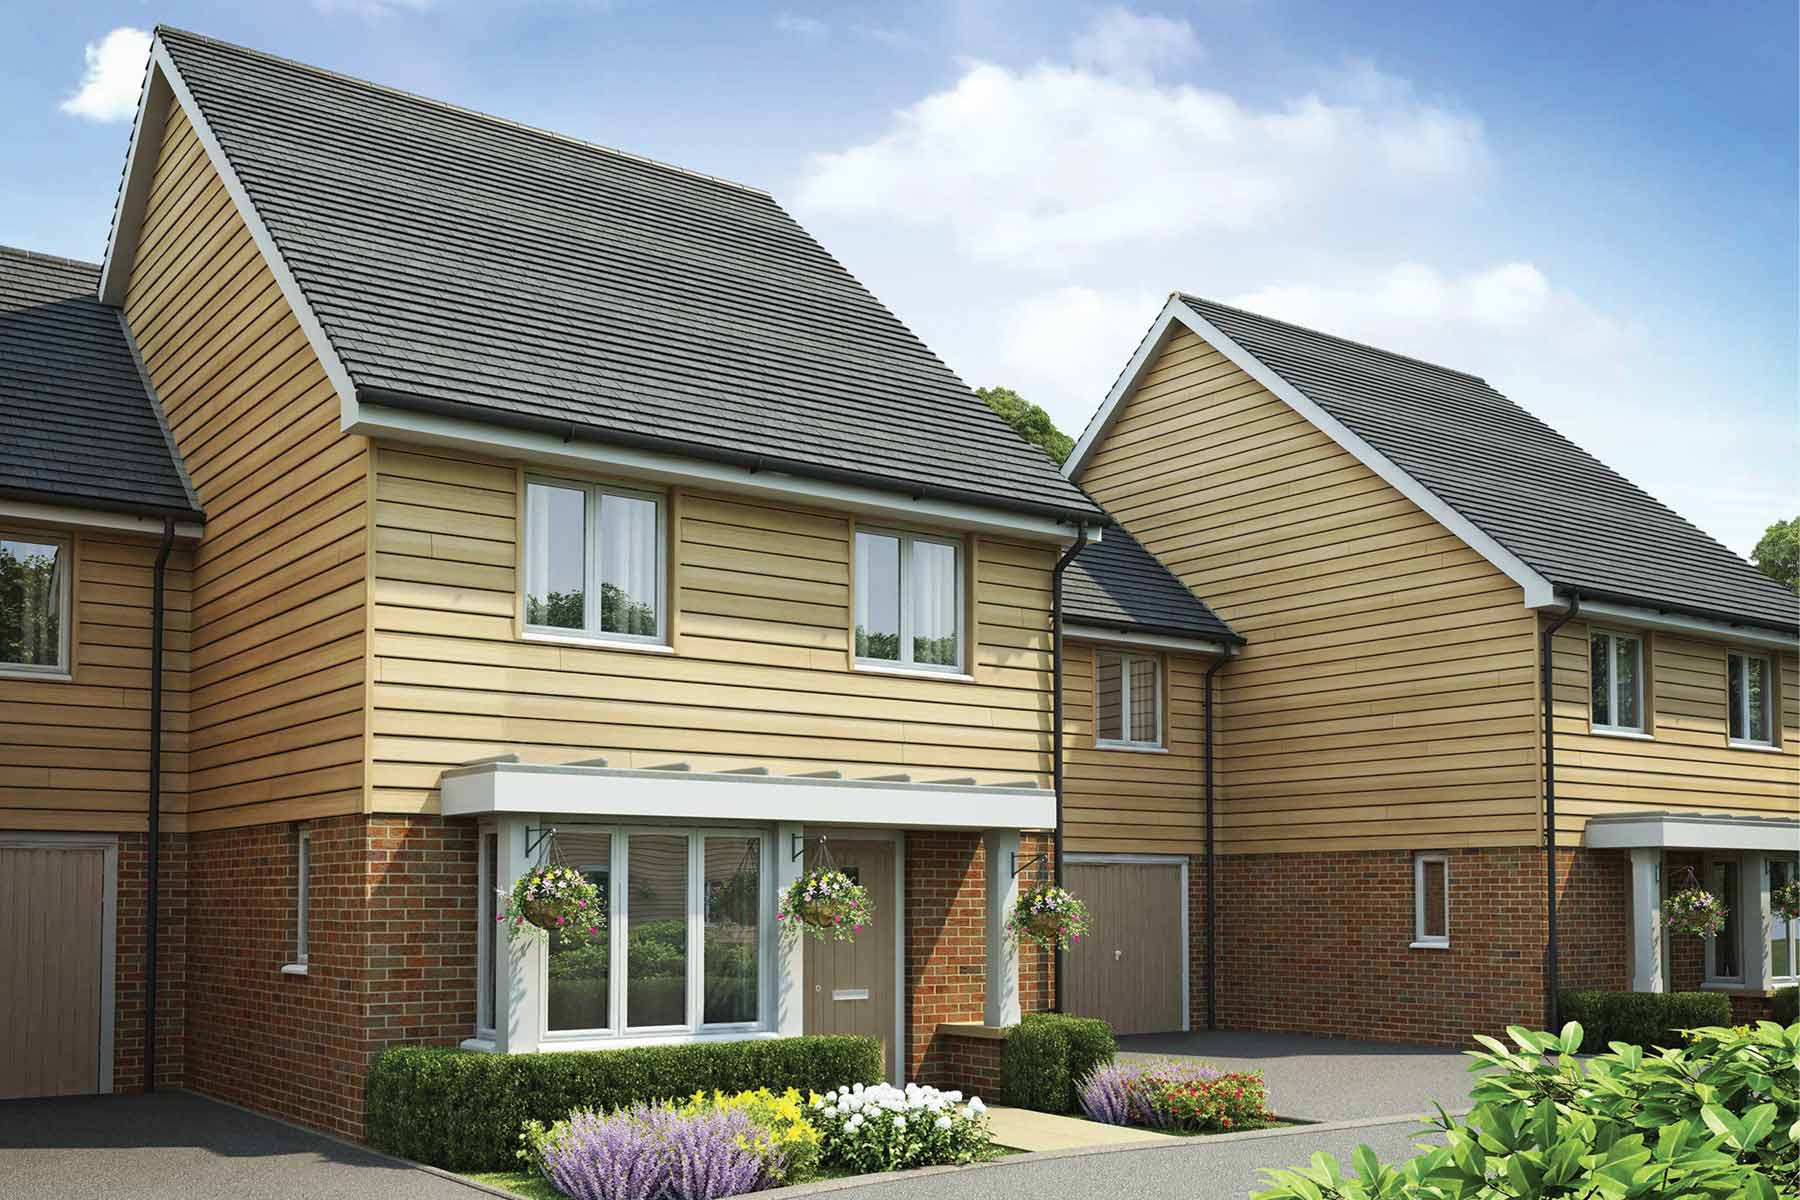 New Homes For Sale In Dartford